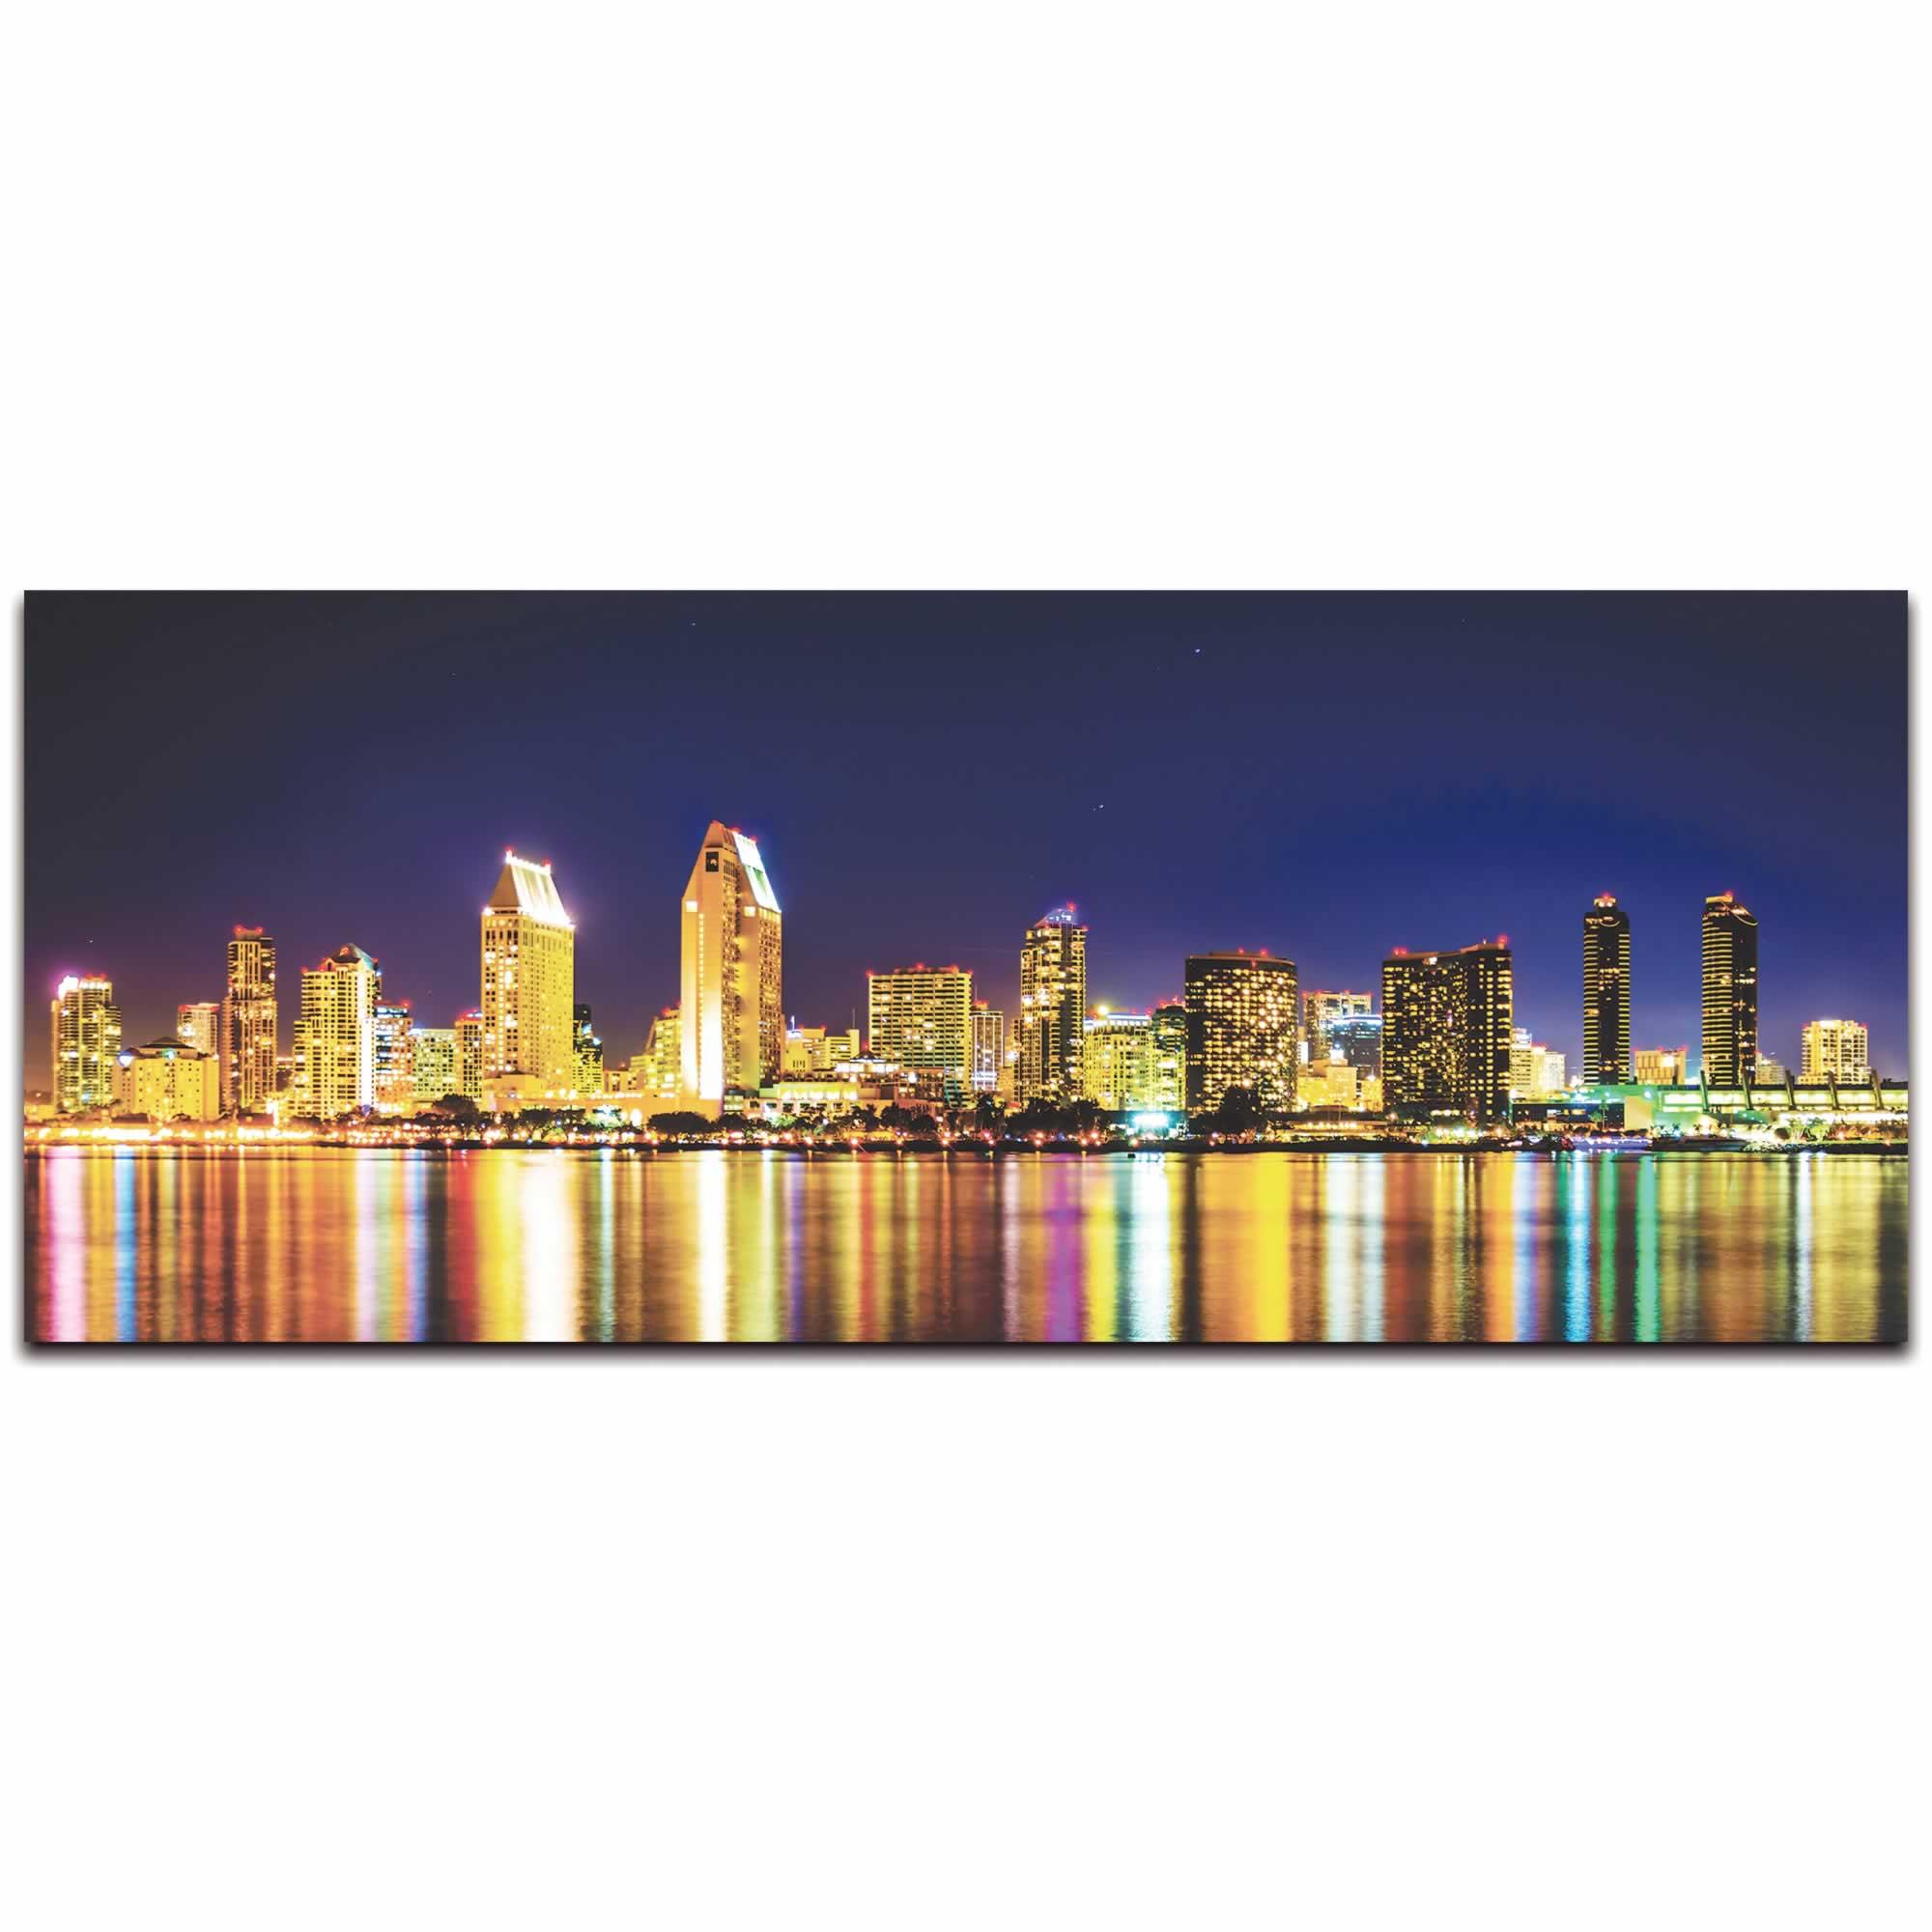 San Diego City Skyline At Night - Urban Modern Art, Designer Home Decor, Cityscape Wall Artwork, Trendy Contemporary Art - Alternate View 2